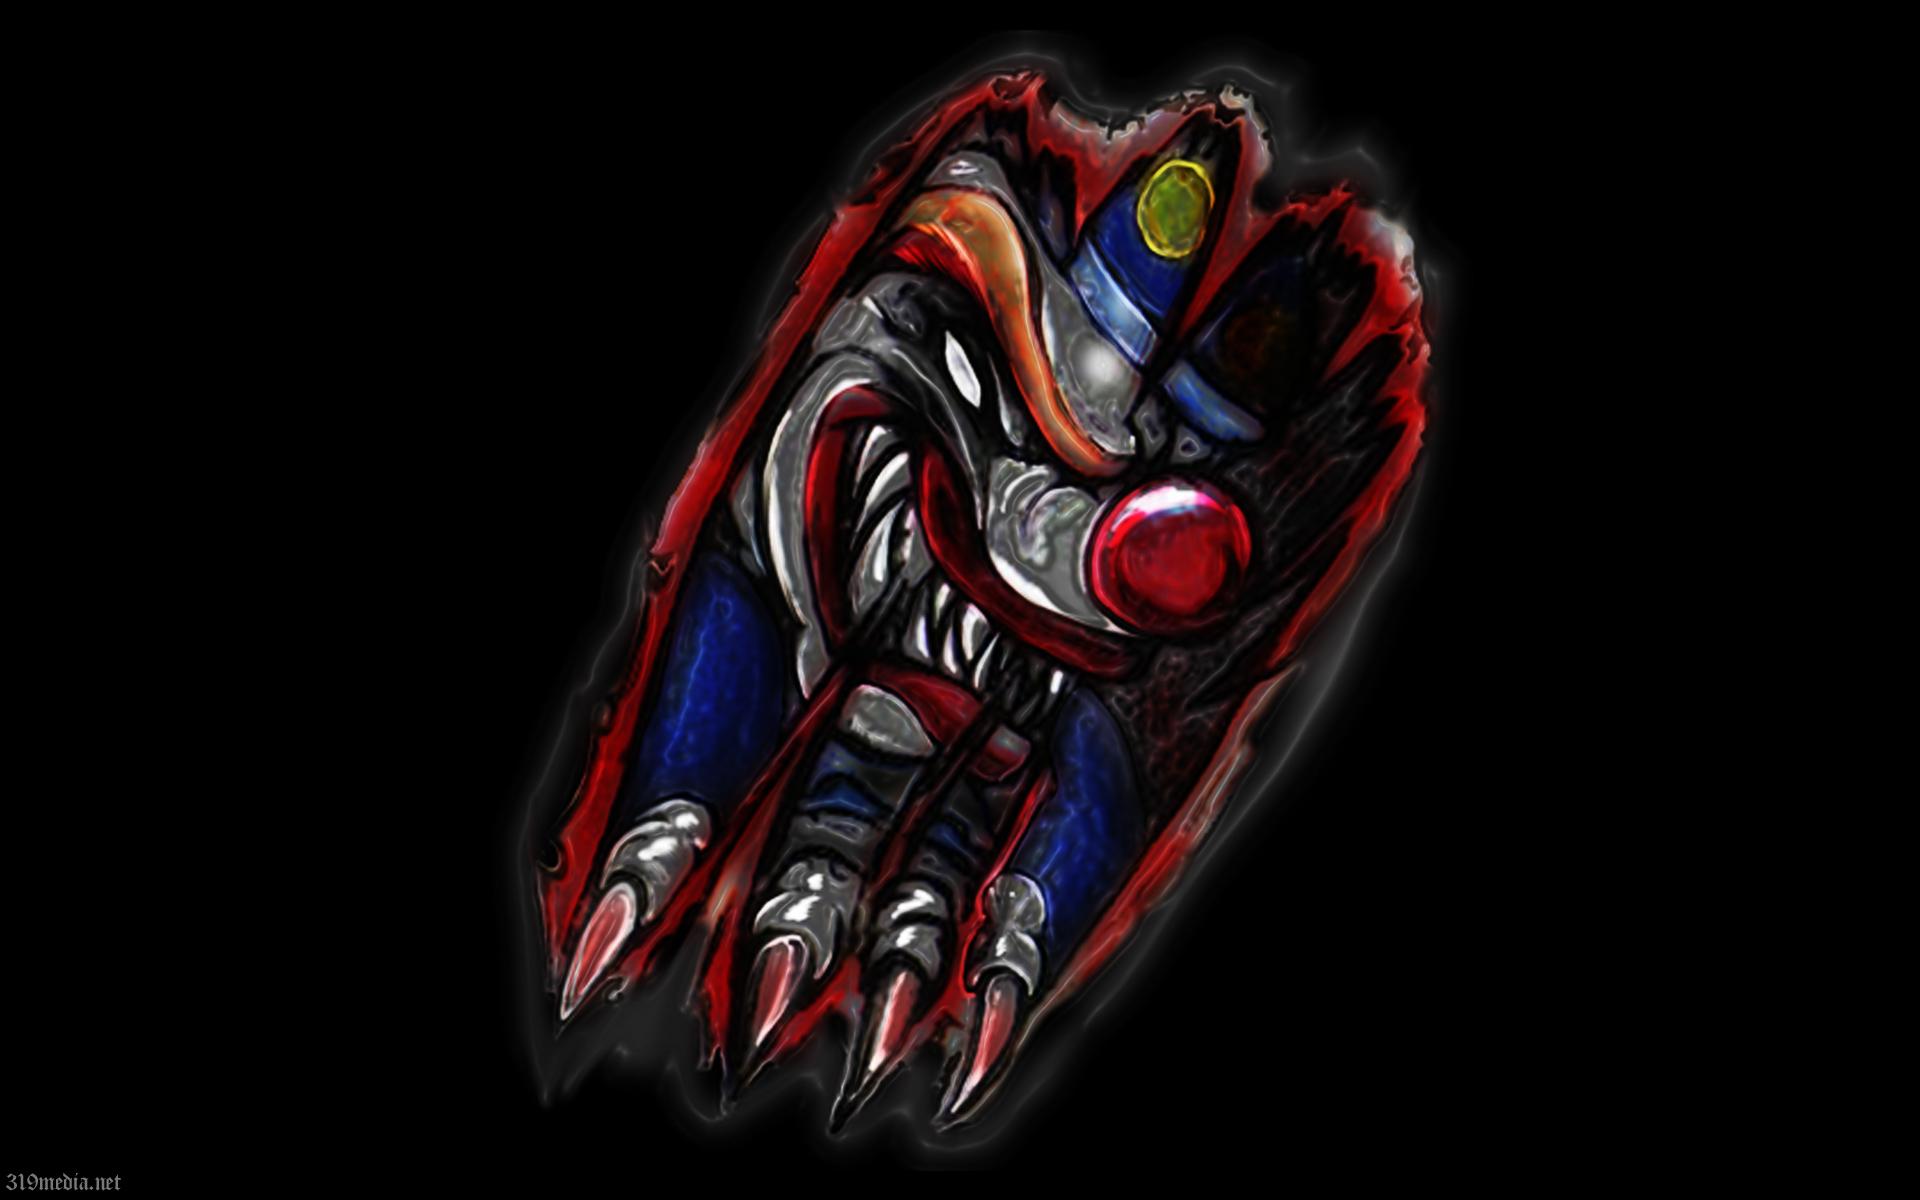 Hd wallpaper evil - Evil Clown Wallpaper Evil Images Dark Clown Dar